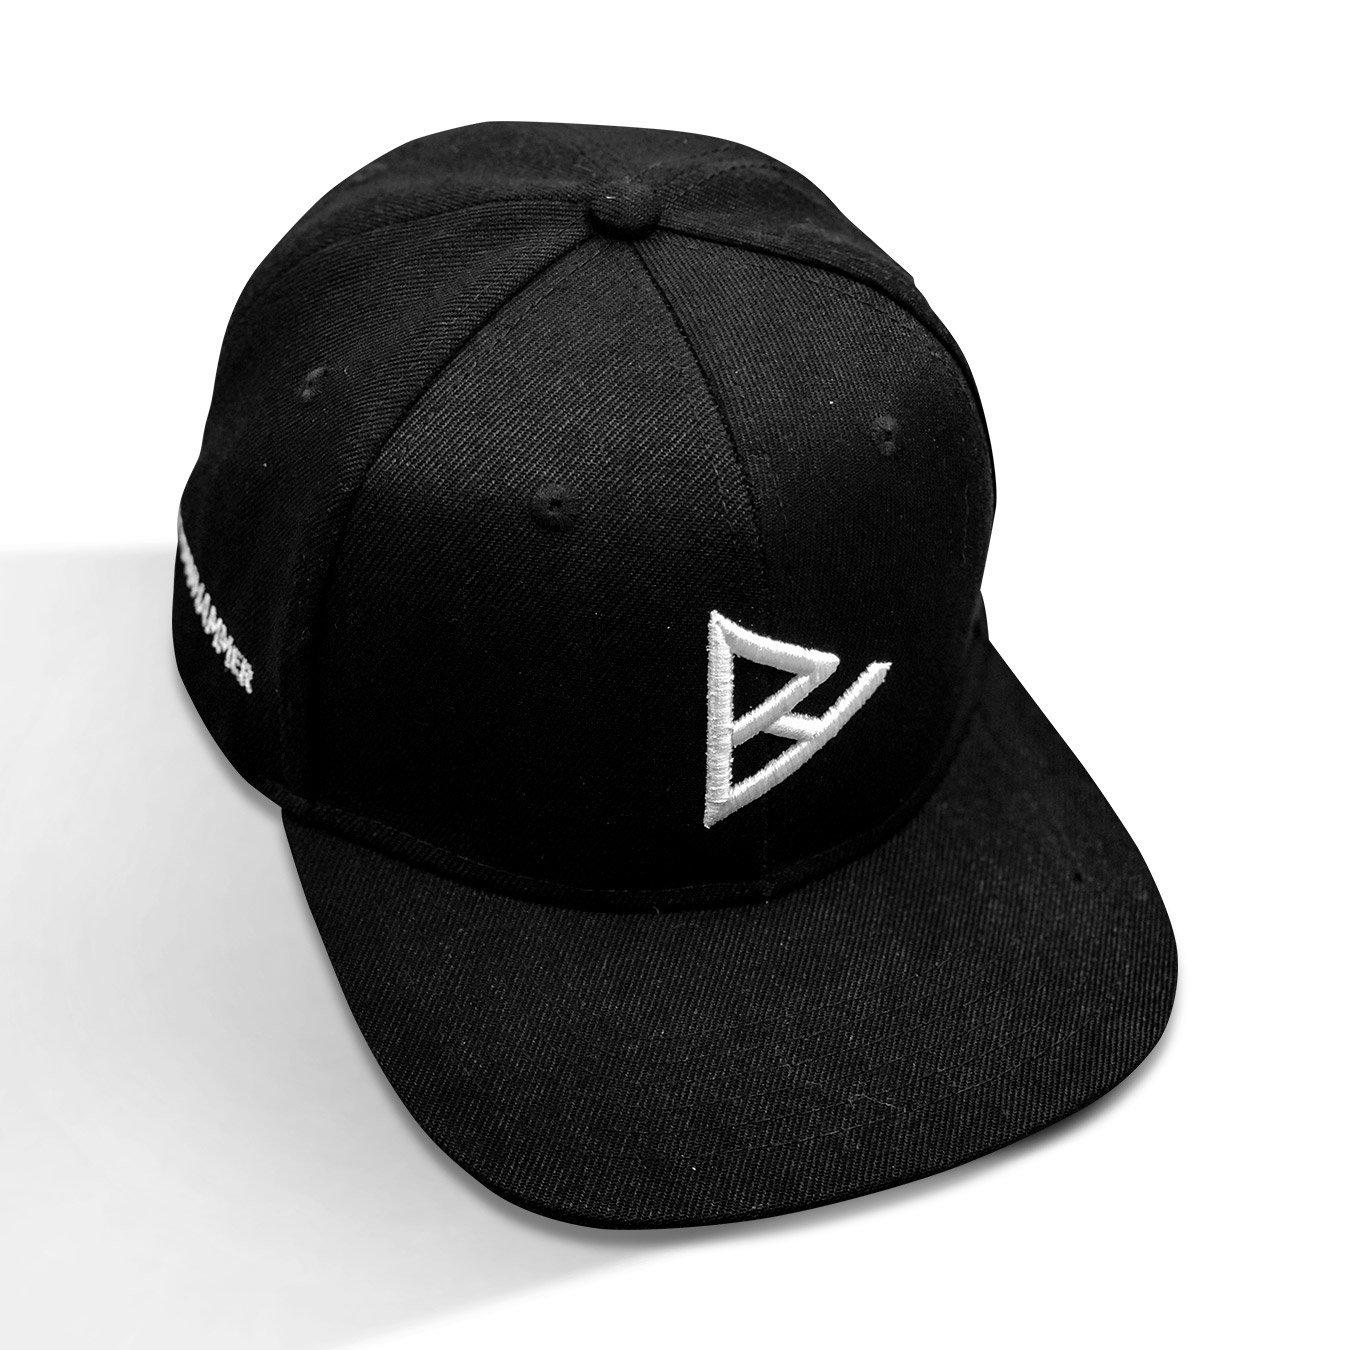 Blowhammer Snapback Cap - Rack Hat BHMHAT00100-0823